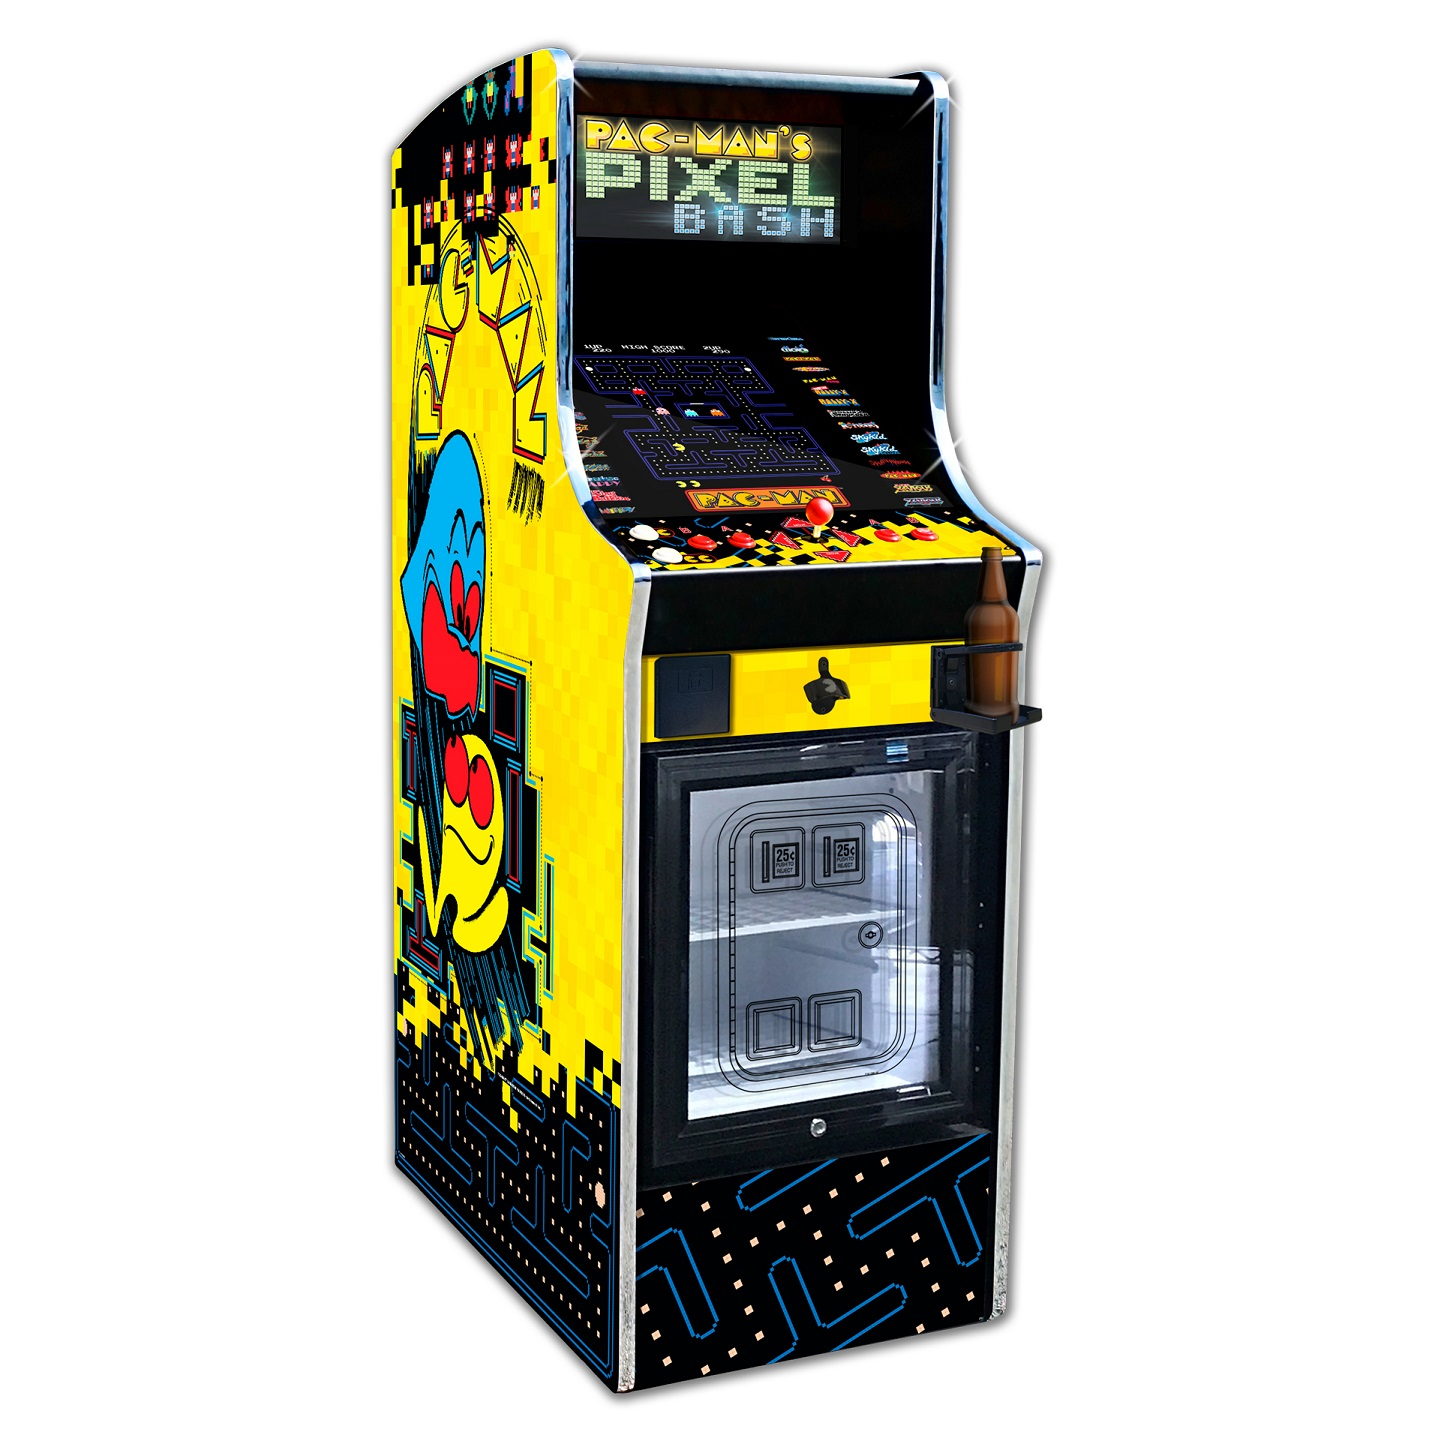 Fine Namco Pac Man Pixel Bash Arcade Machine Game Home Cabaret Download Free Architecture Designs Remcamadebymaigaardcom